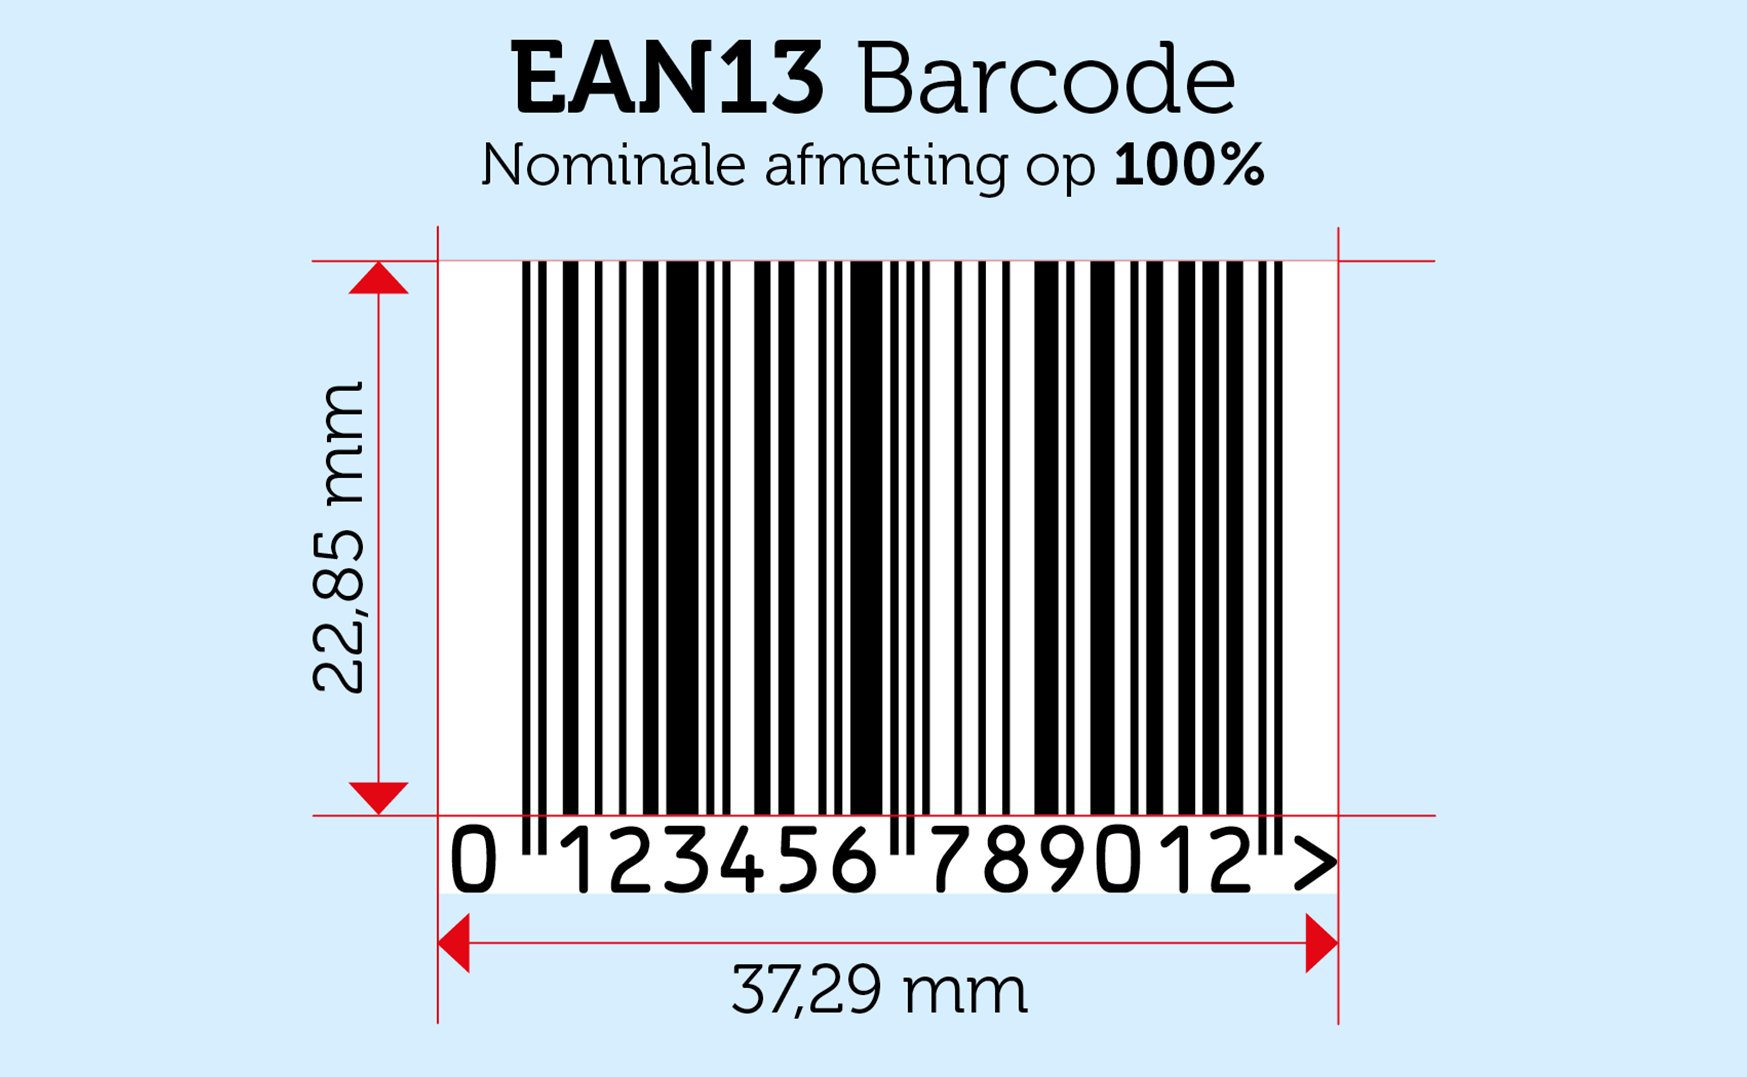 ean 13 barcode nummer afbeelding